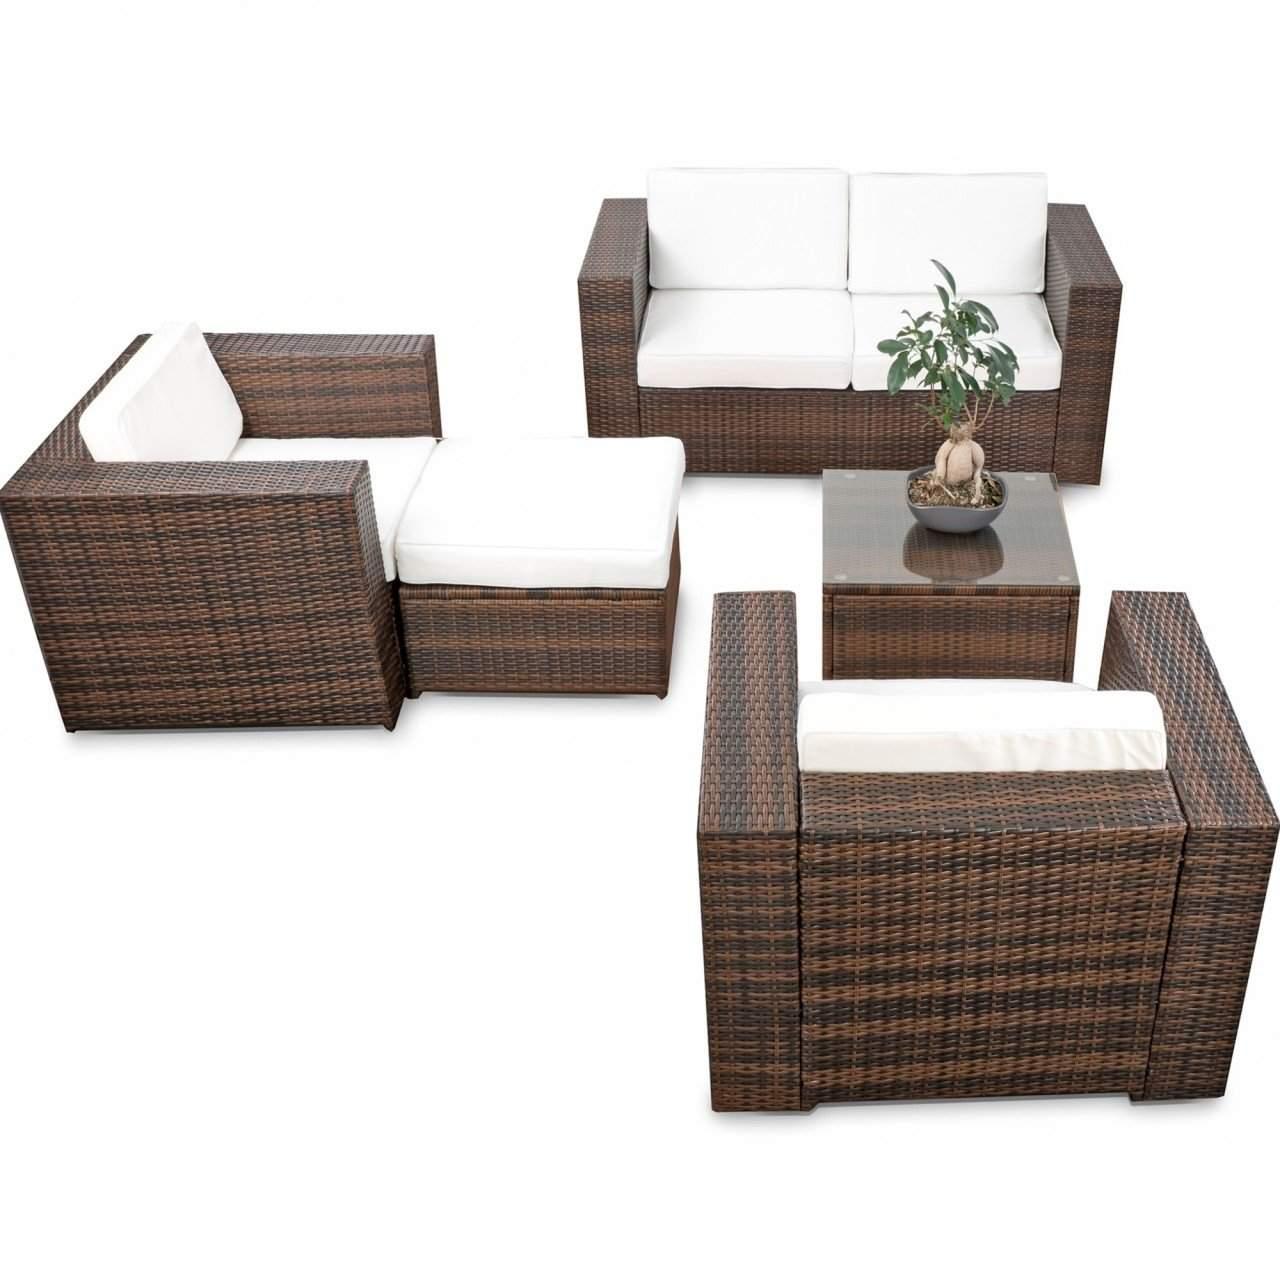 balkon loungemoebel xl 15 tlg polyrattan braun 1280x1280